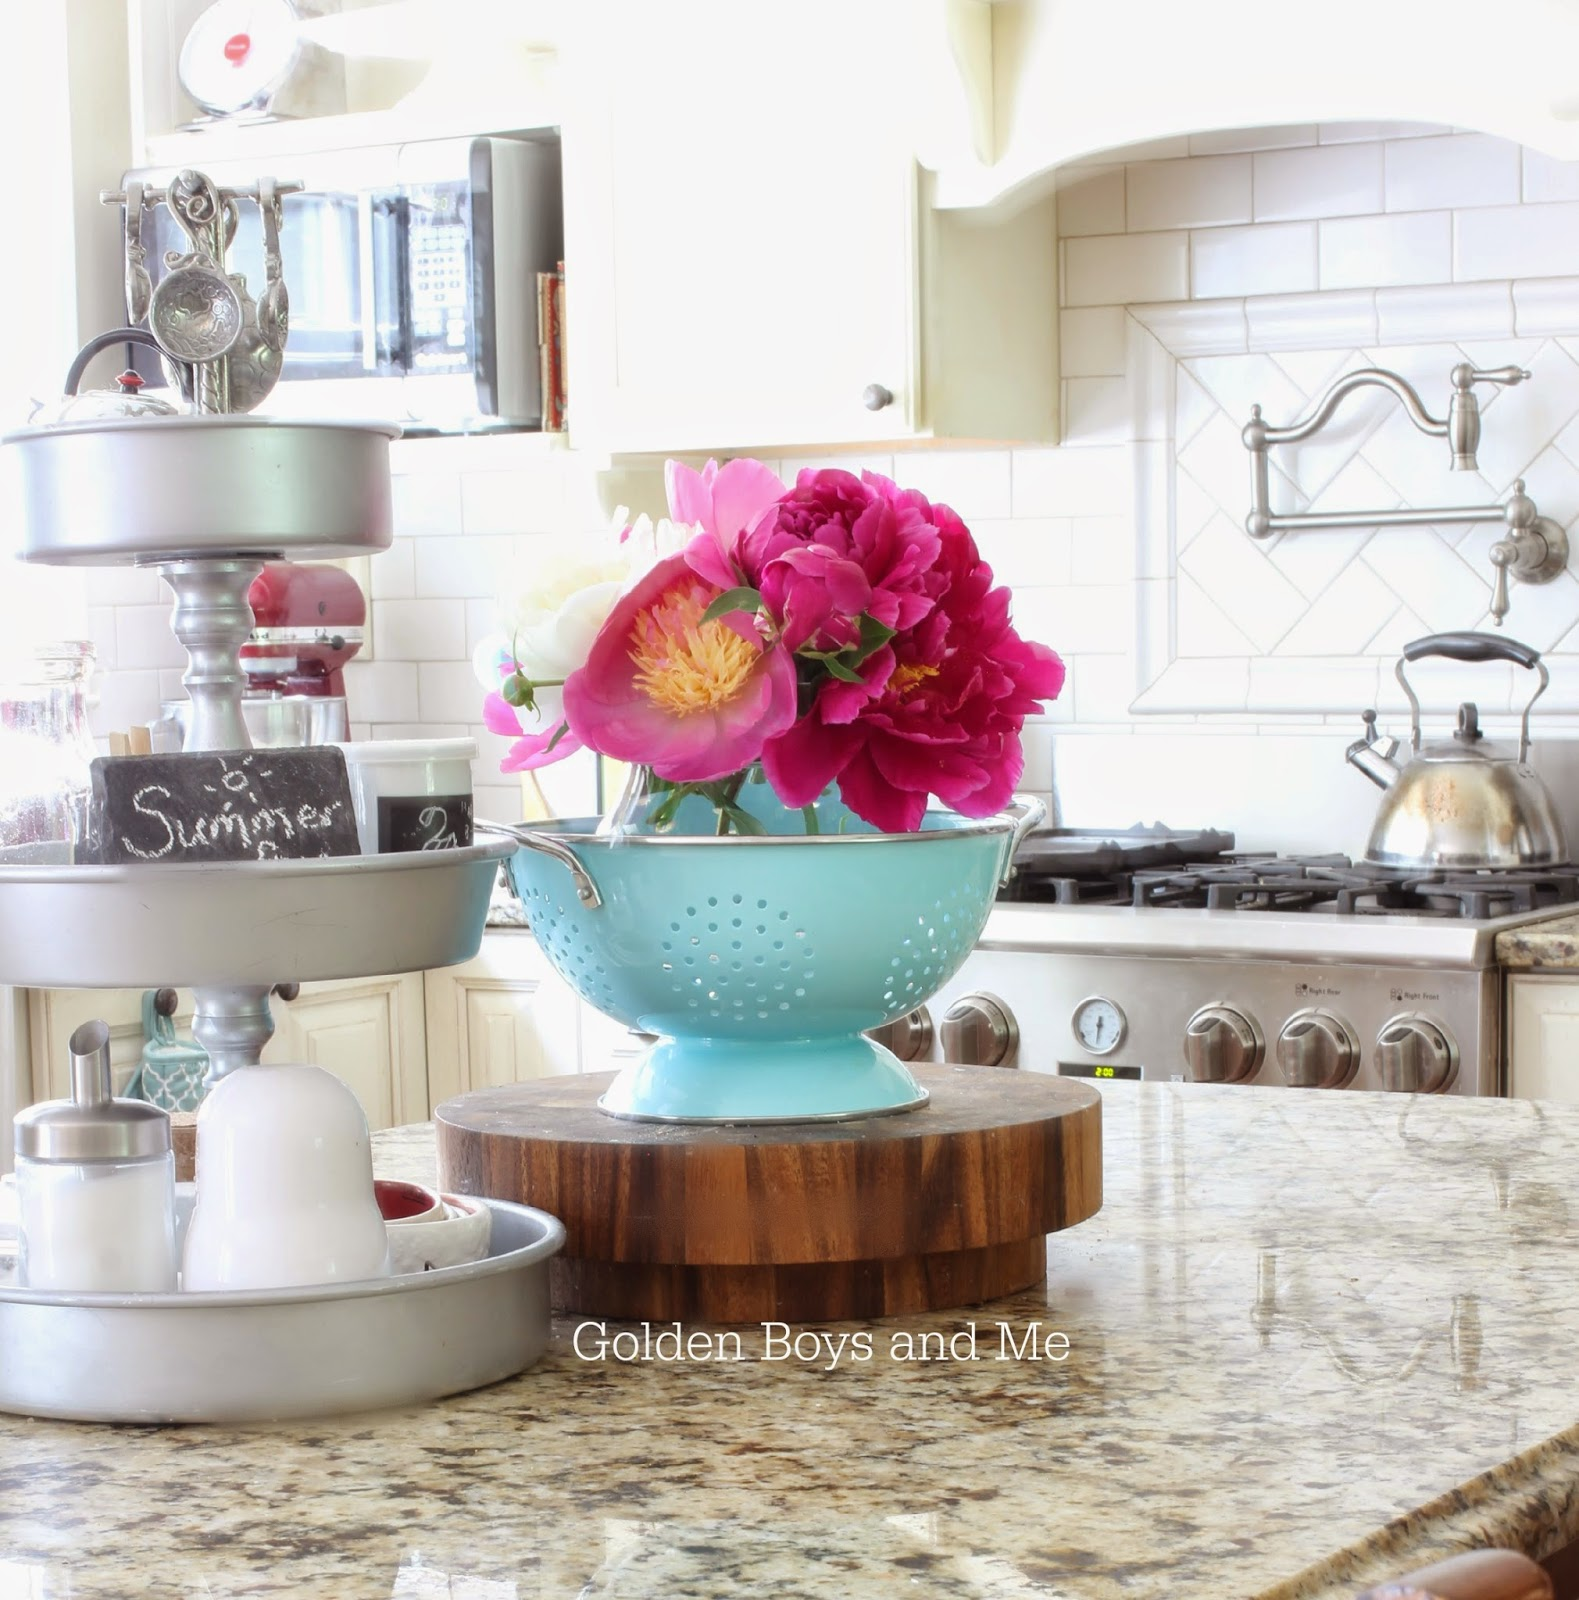 fresh cut flowers peonies displayed in a kitchen colander-www.goldenboysandme.com